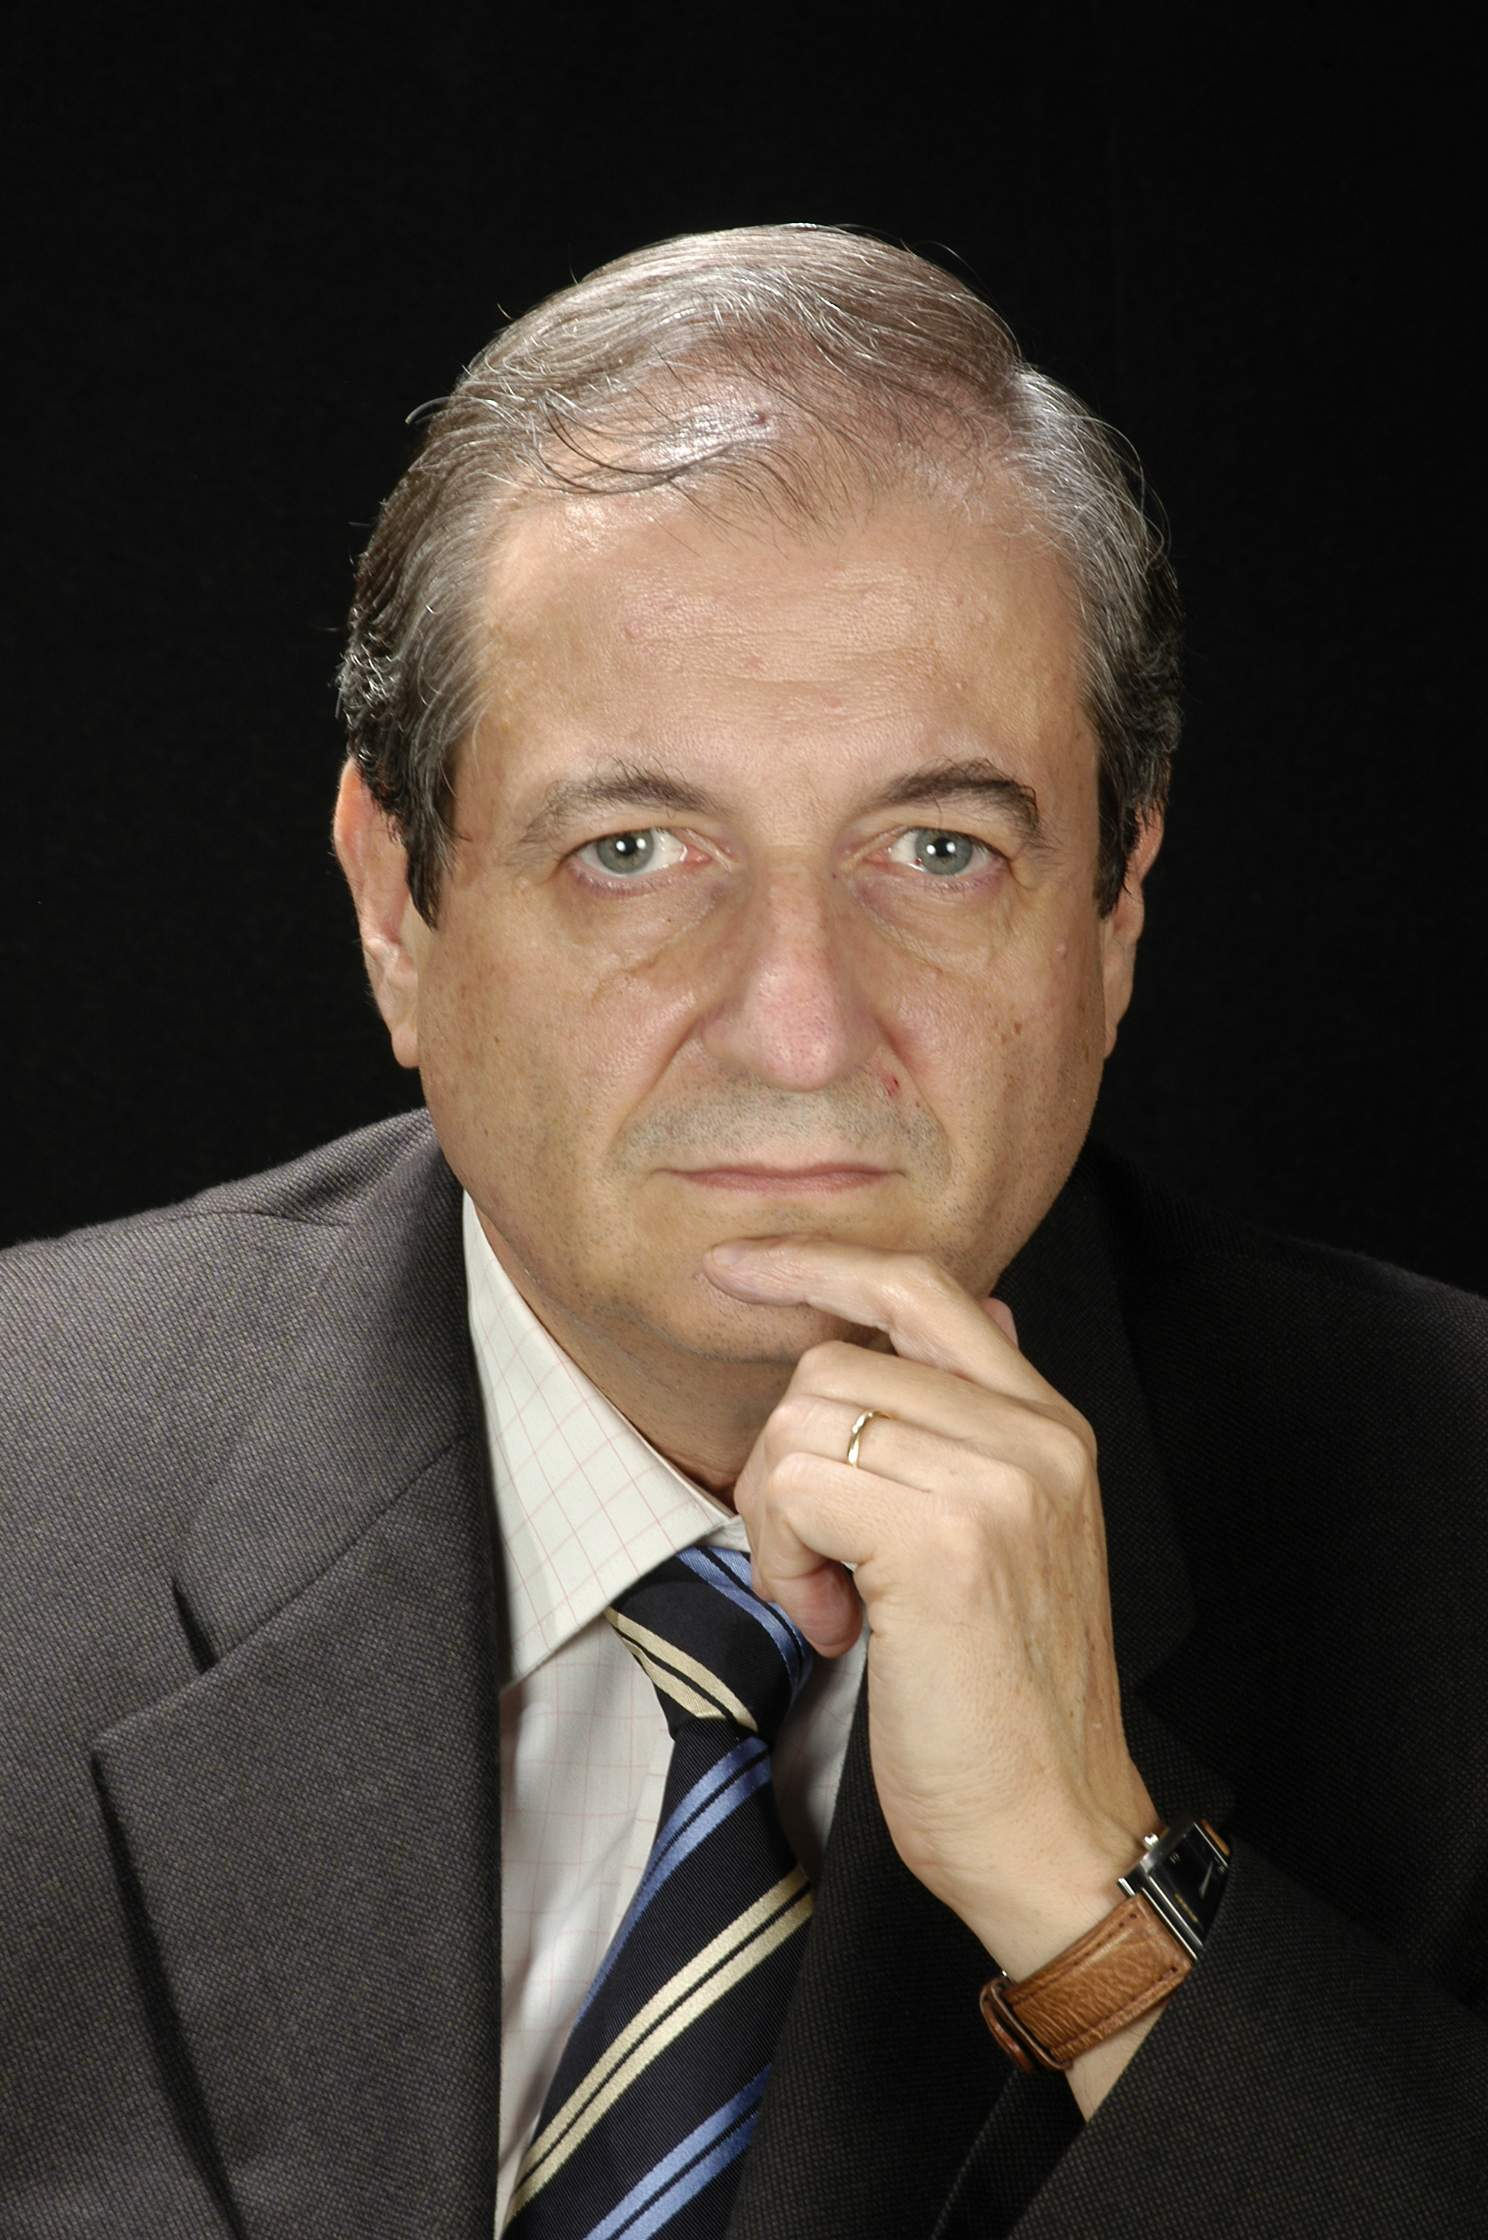 Dr. Agustí Perelló i Juncà